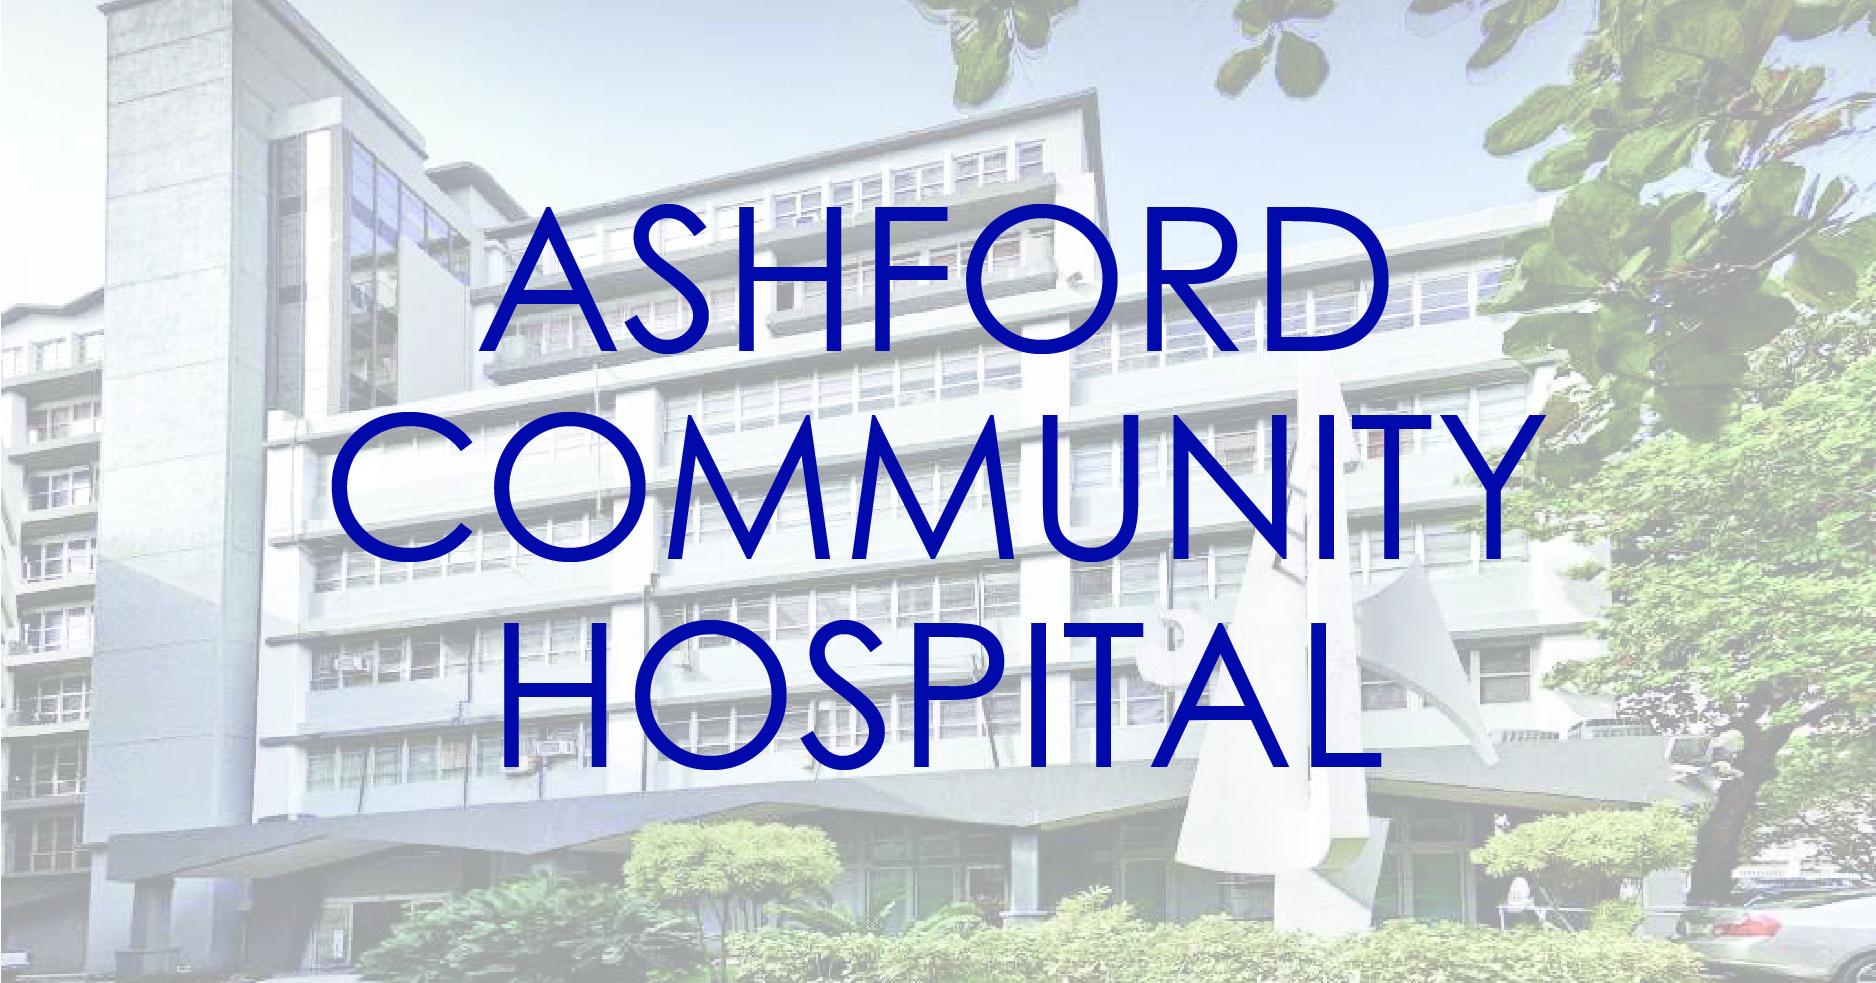 Ashford Community Hospital-01.jpg